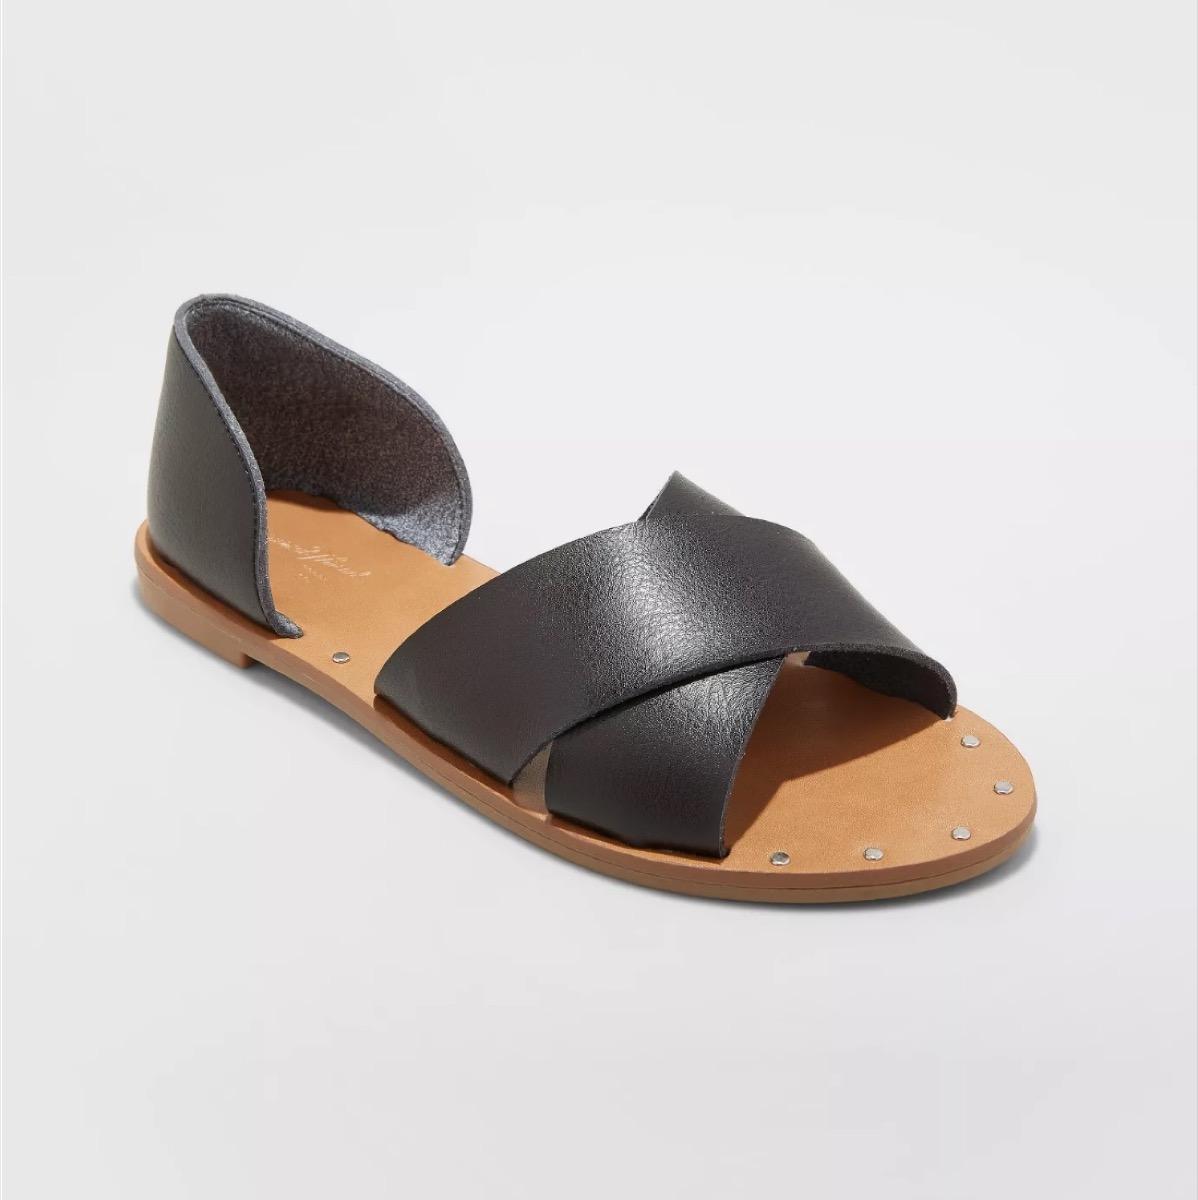 black faux leather sandals, affordable sandals